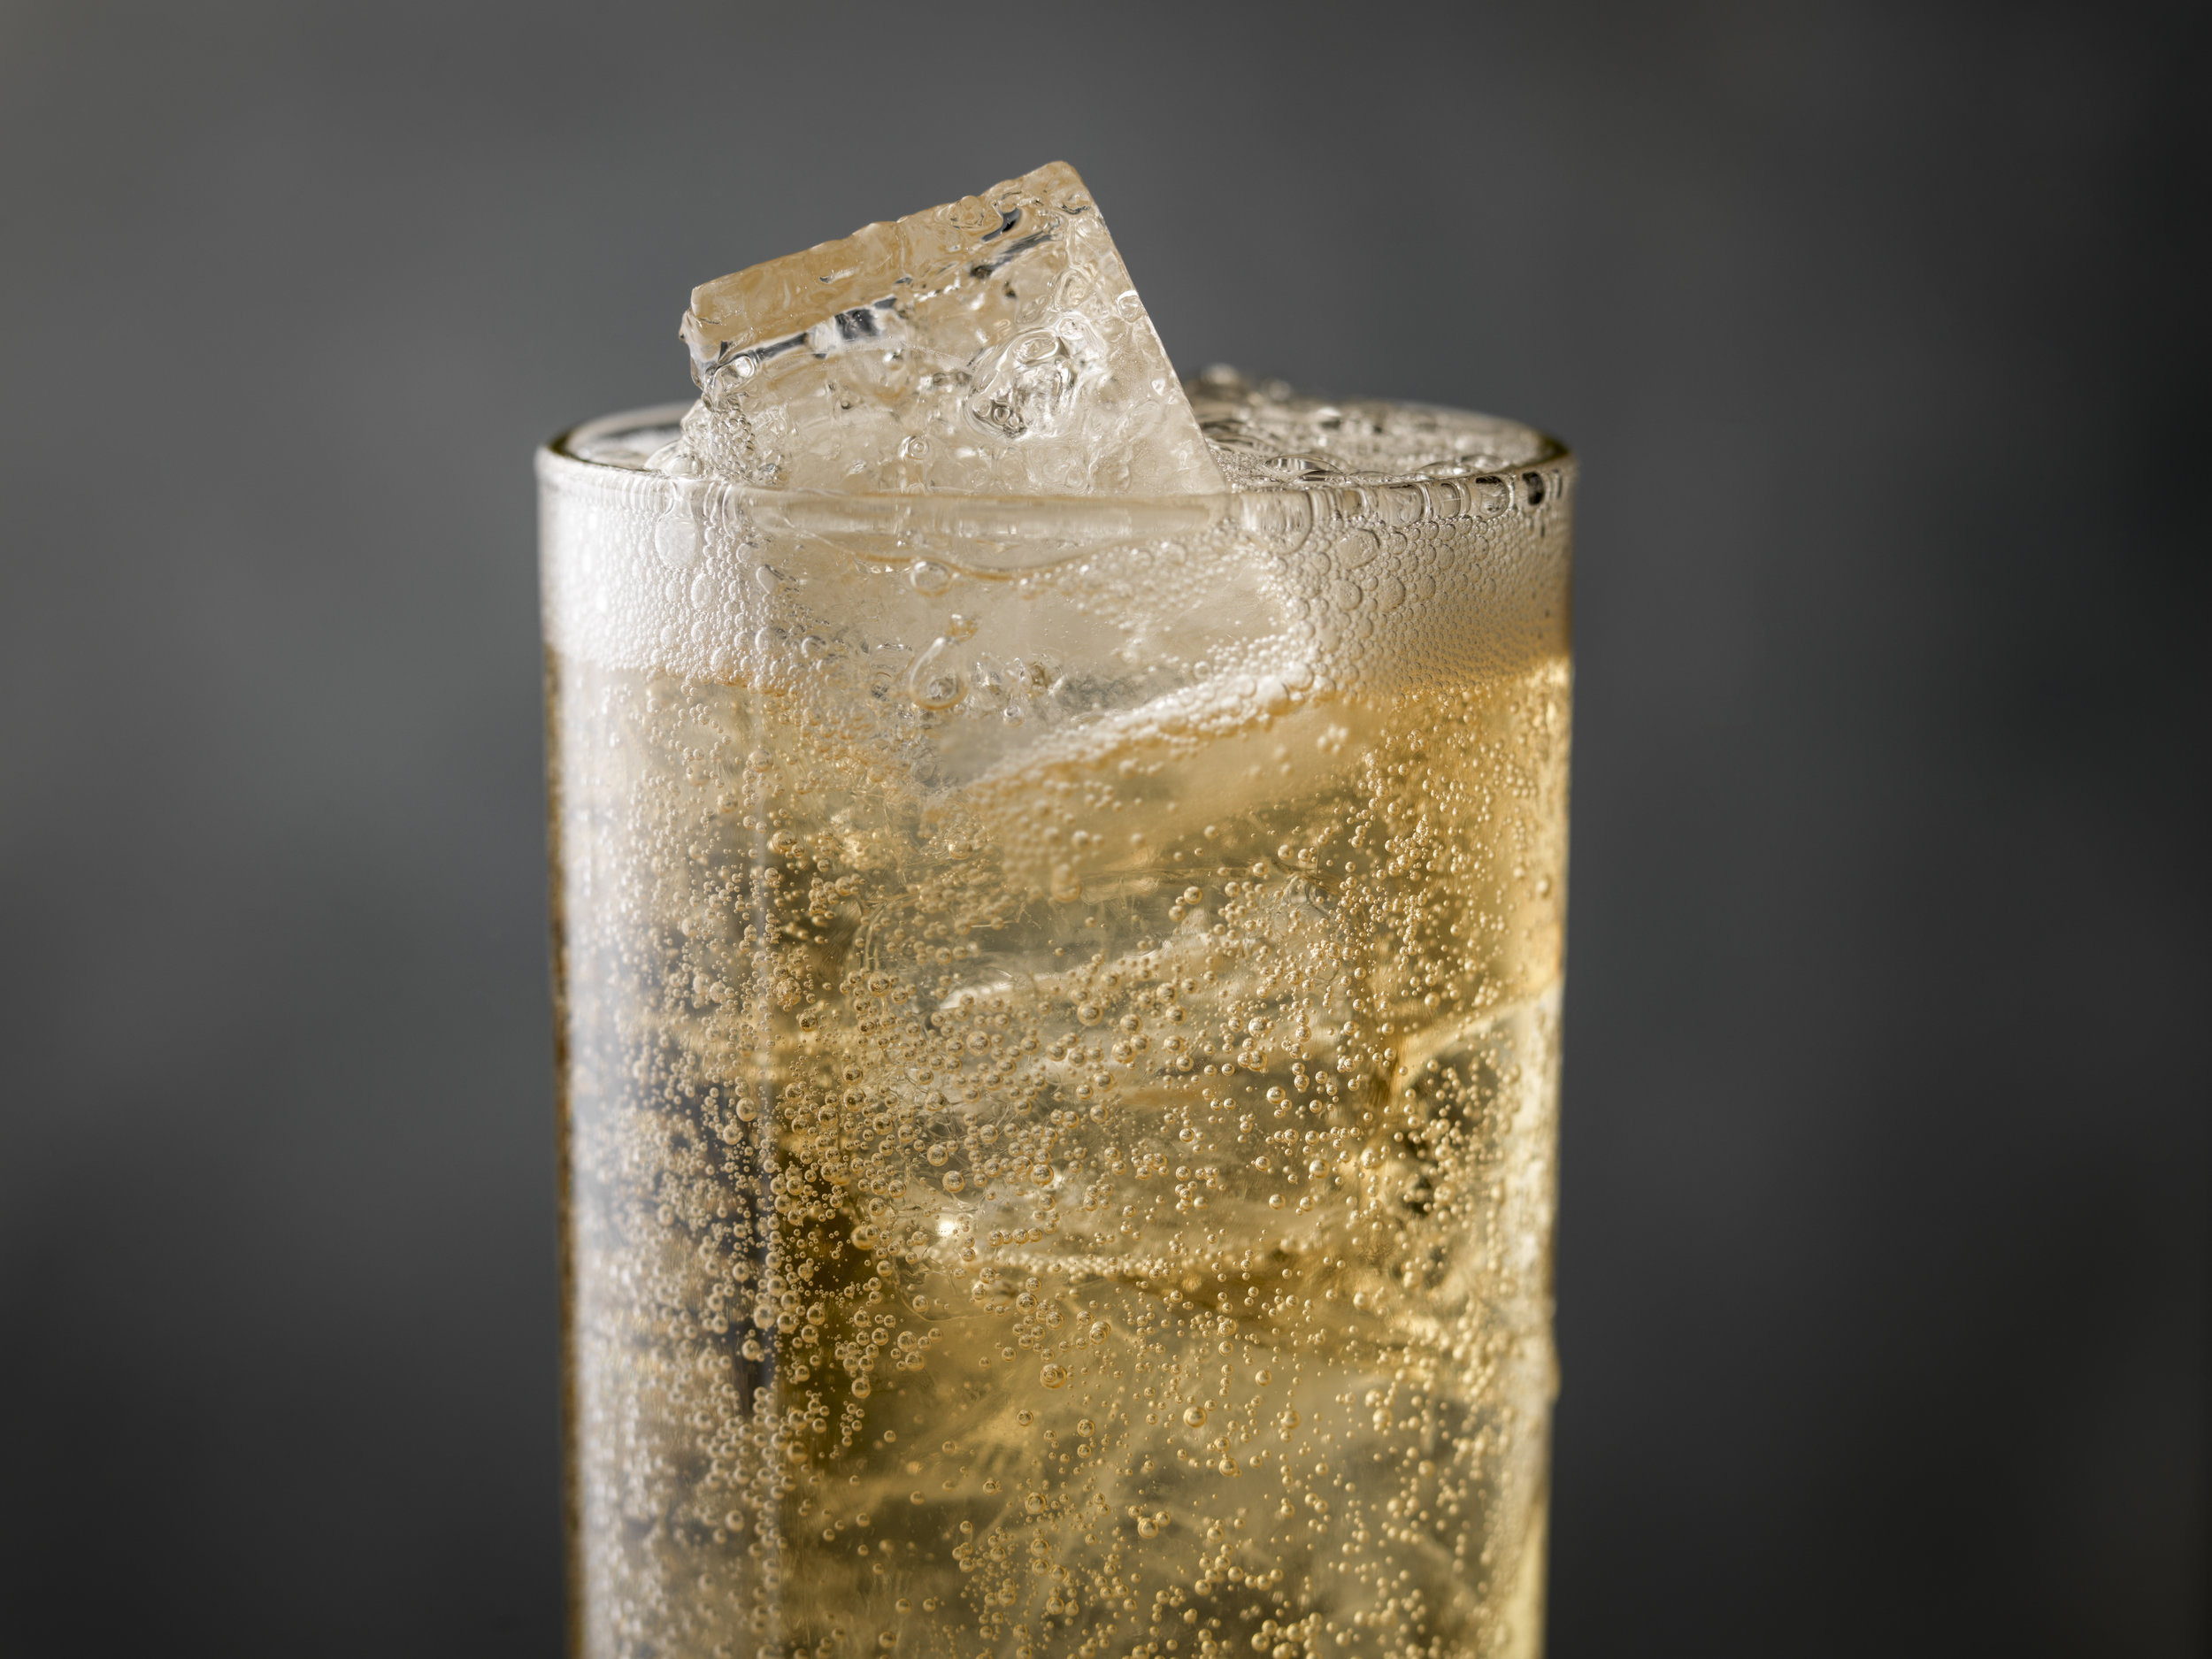 cocktail_tonic_close_up_0623.jpg